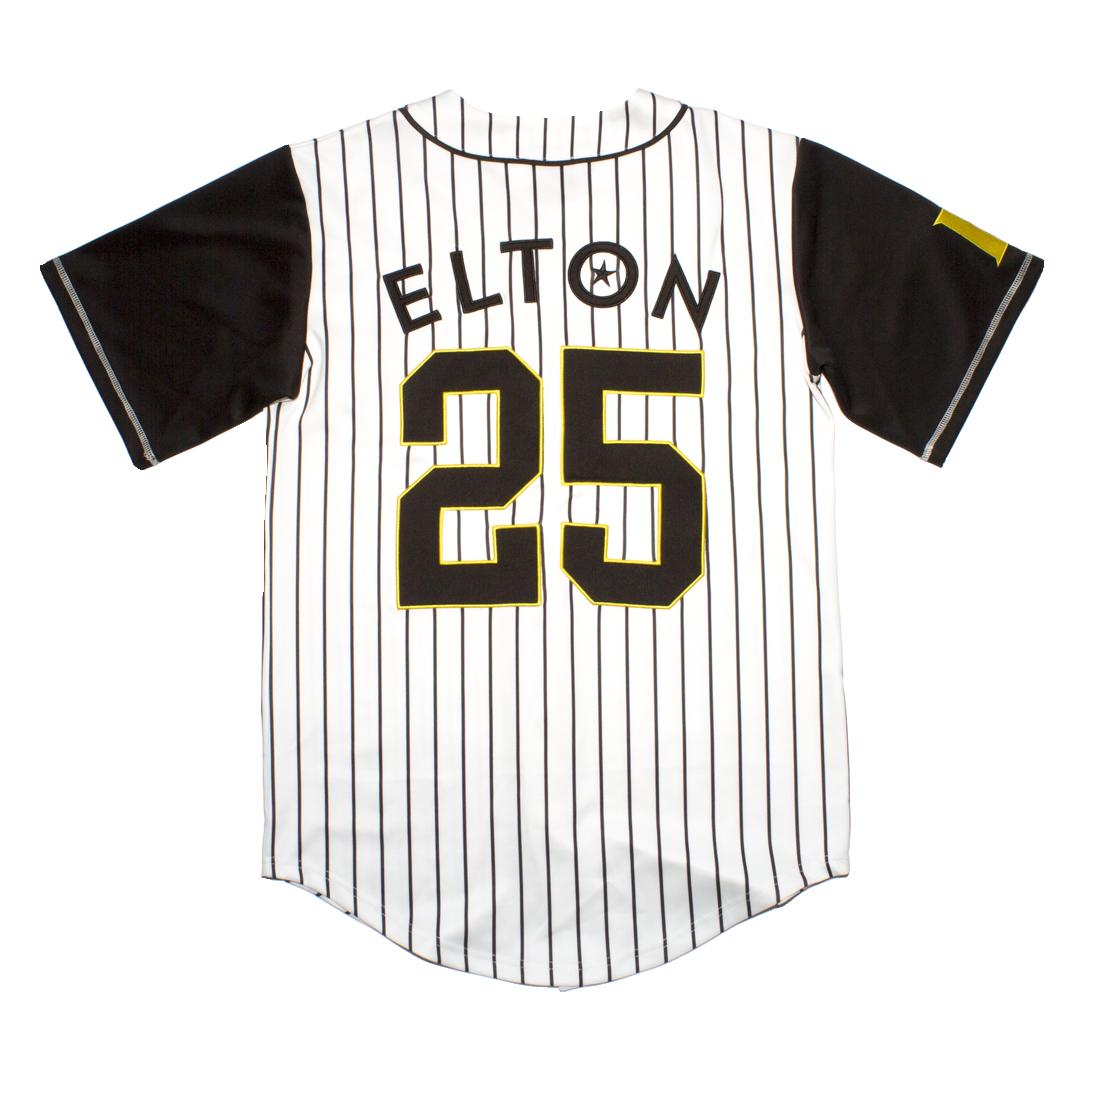 Elton John: E* Baseball Jersey - S